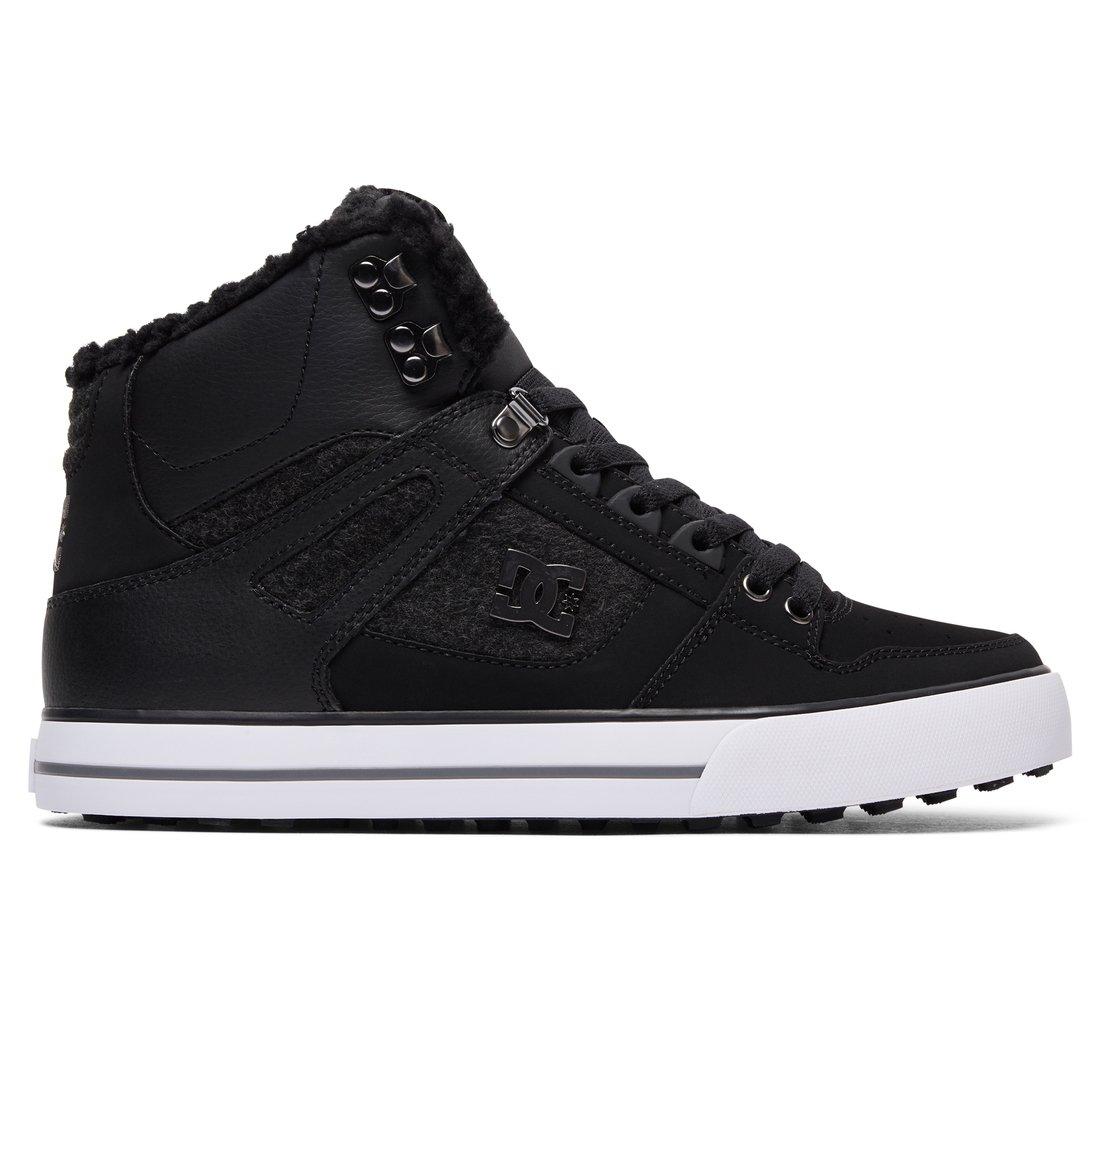 Zapatos Dc Heathrow Negro-Tan (Eu 46 / Us 12 , Negro)